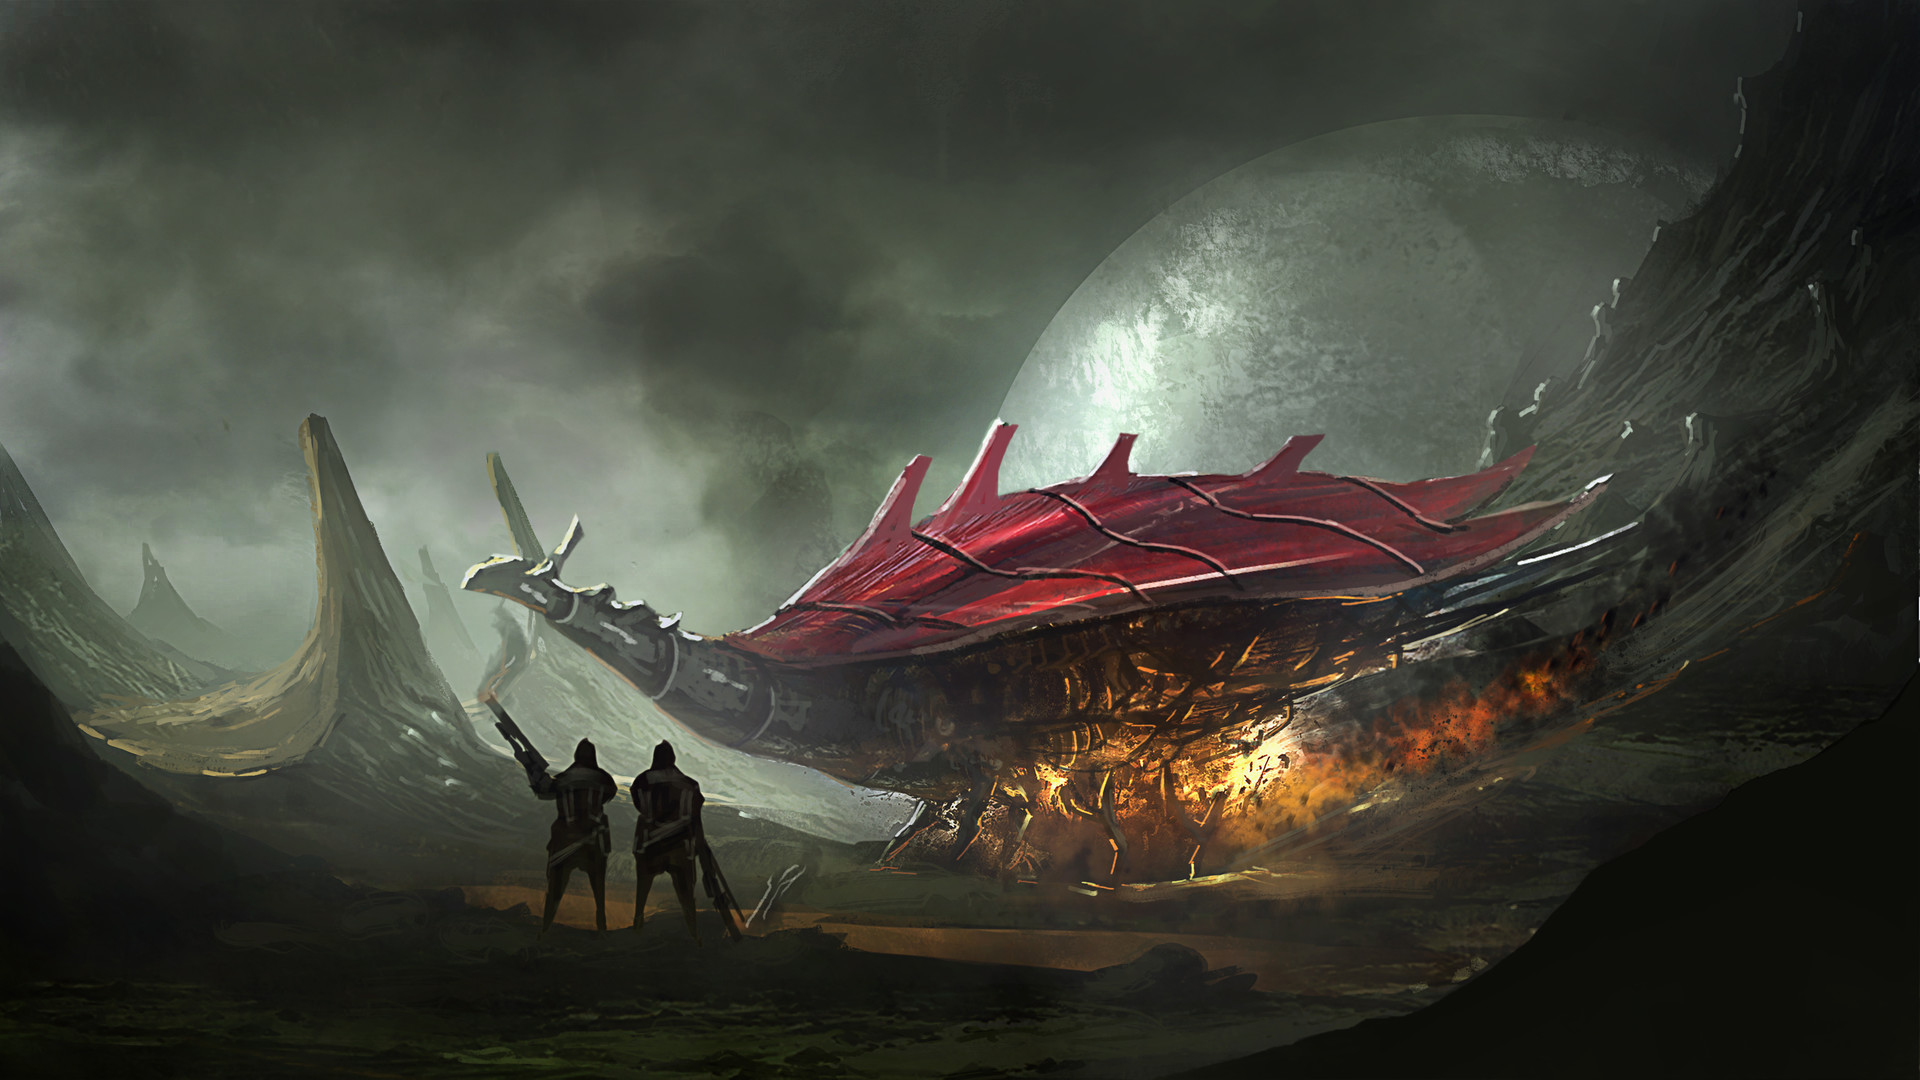 Godwin akpan speed paint alien planet